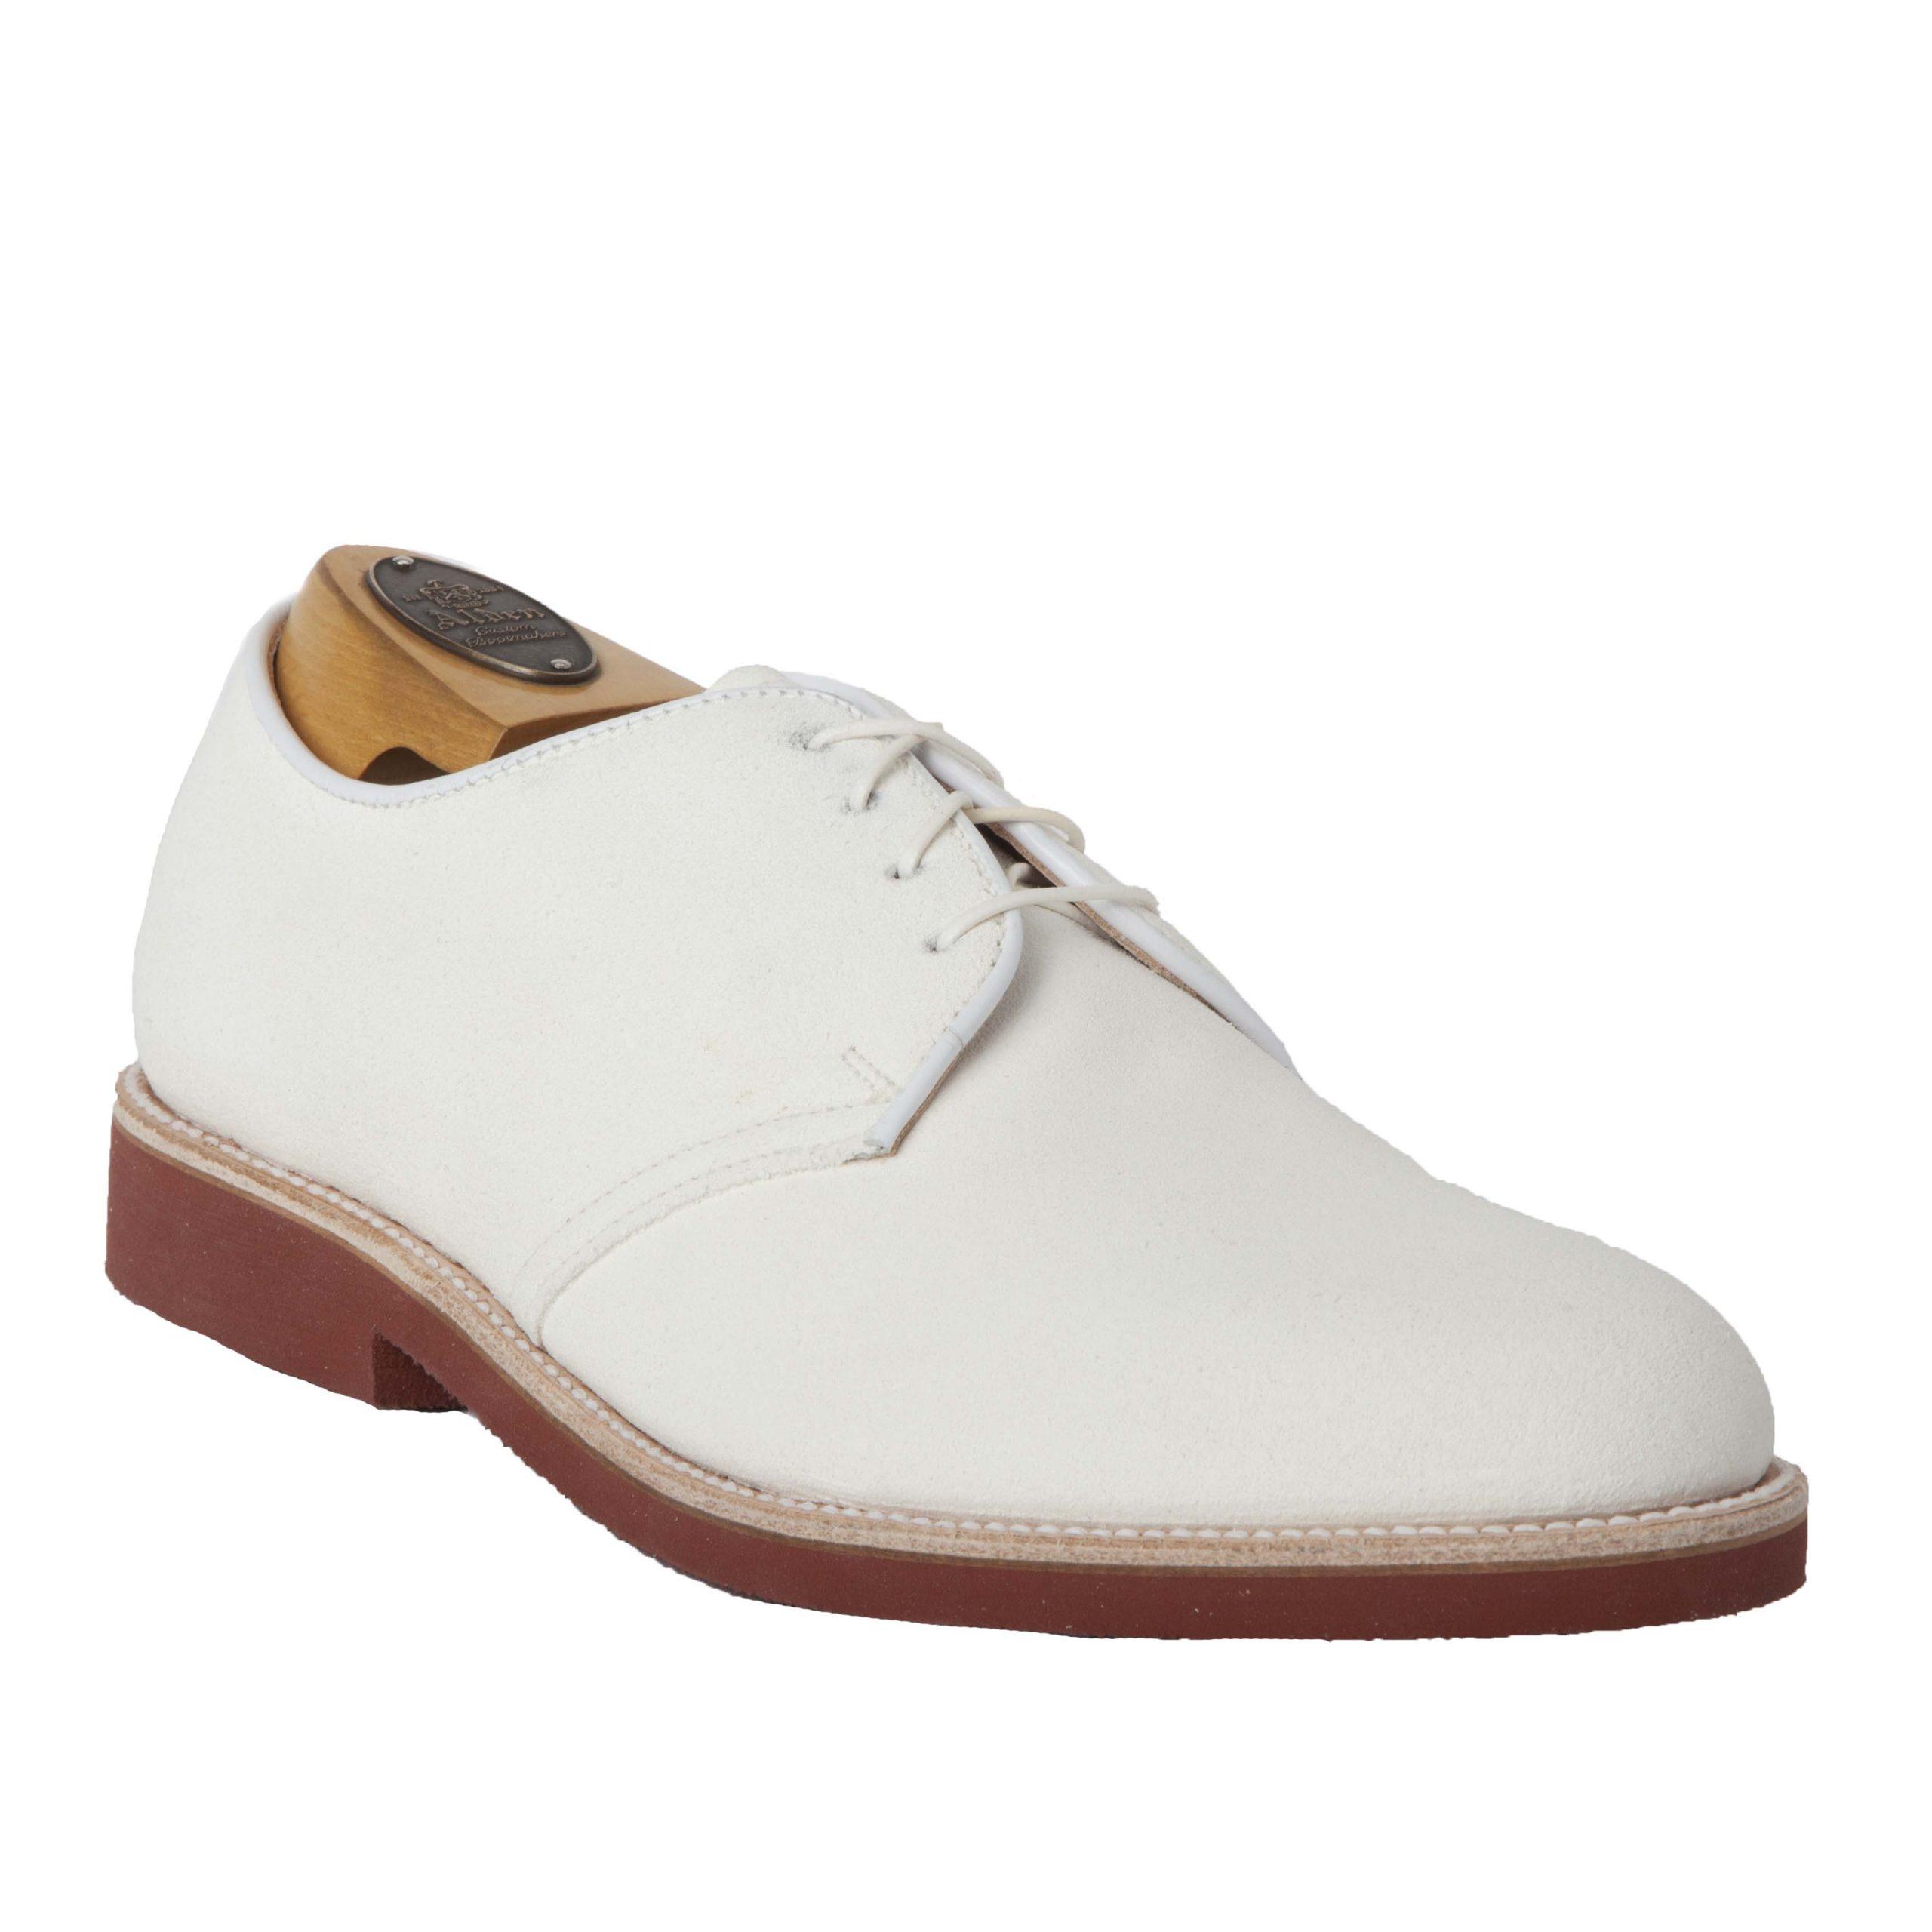 White Buck2635 – Alden Shoes Madison